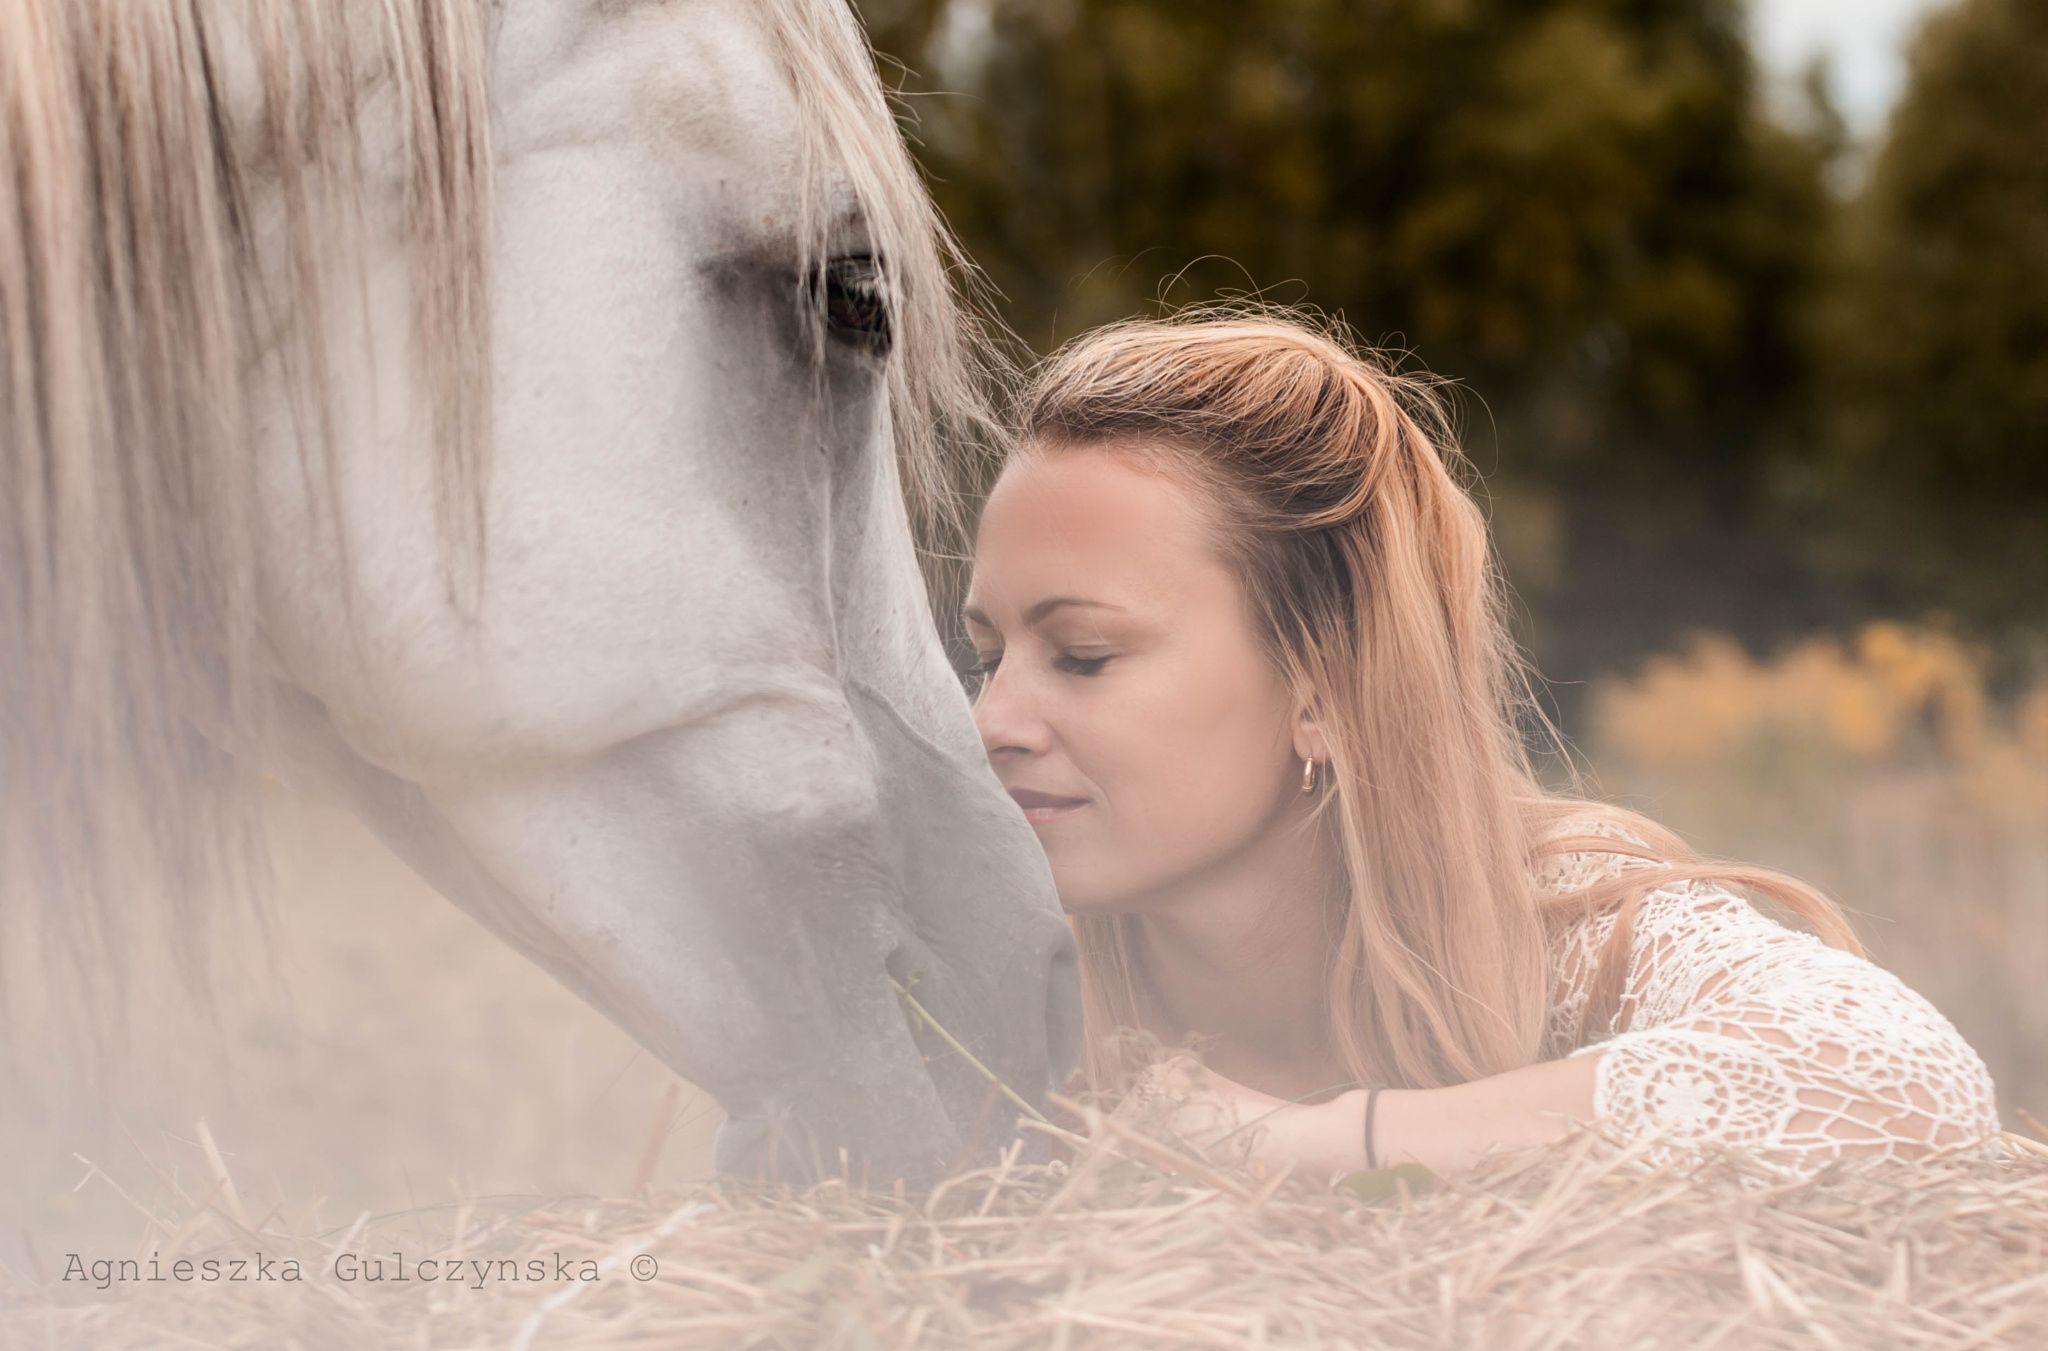 happiness does have a smell by Agnieszka Gulczyńska on 500px